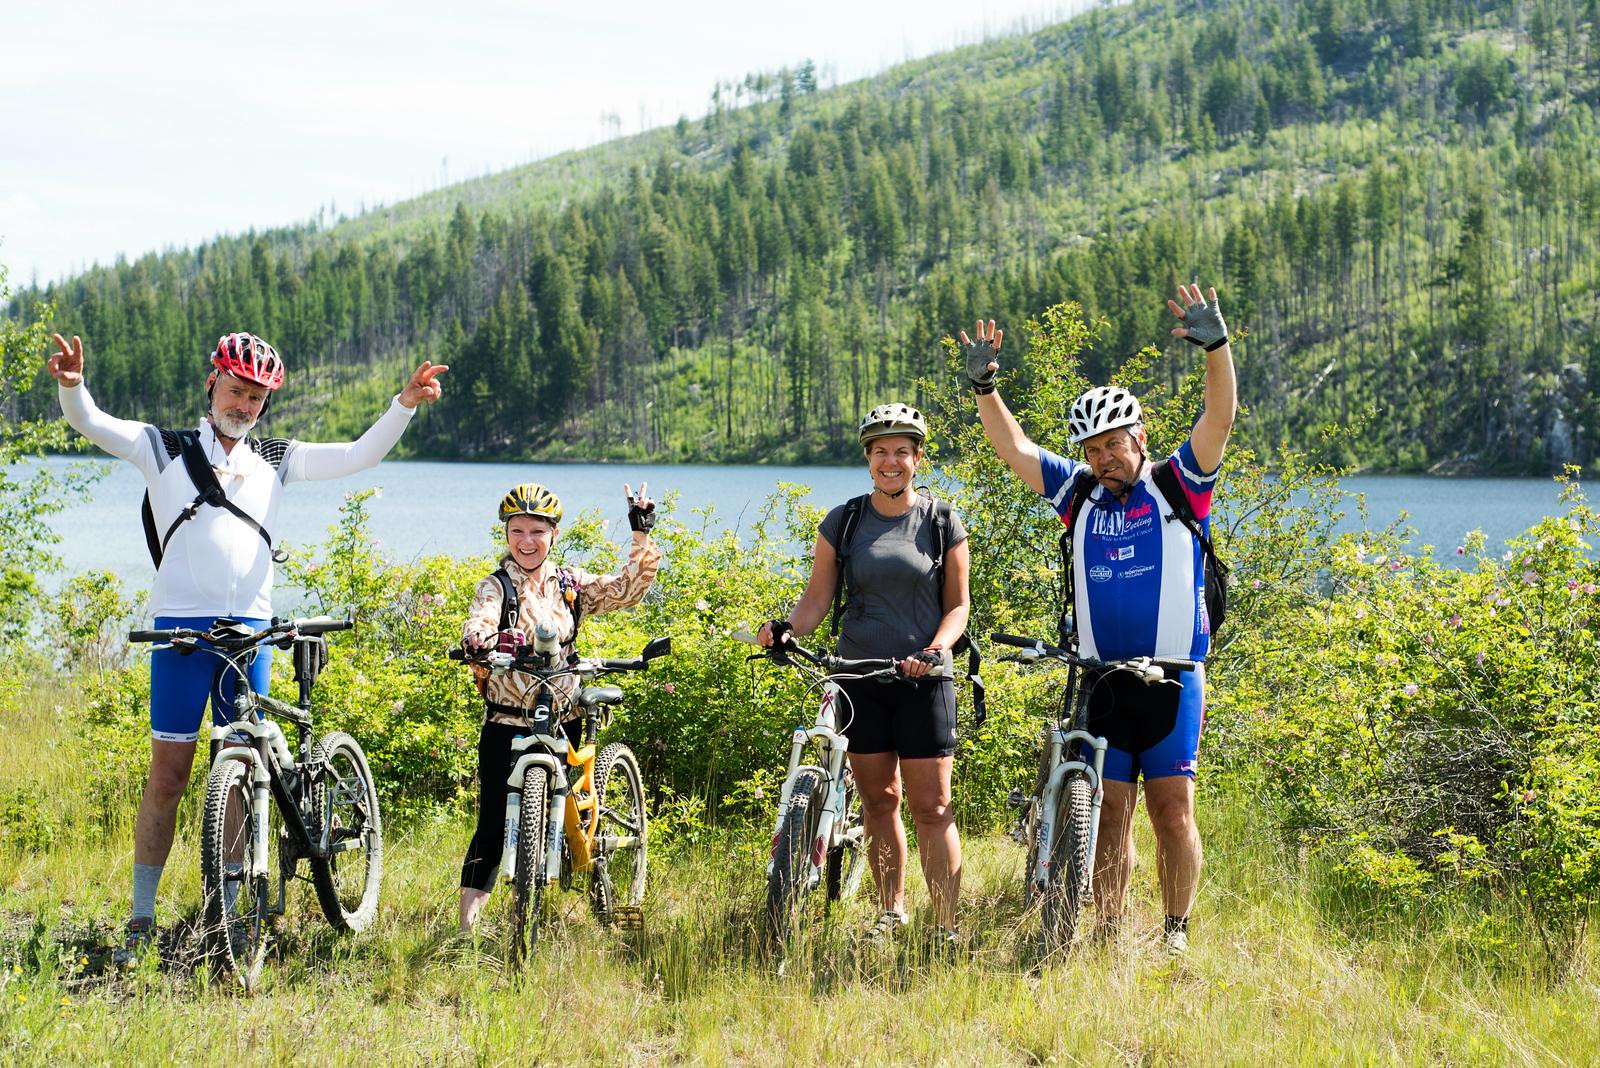 Canada: British Columbia Okanagan KVR Bike